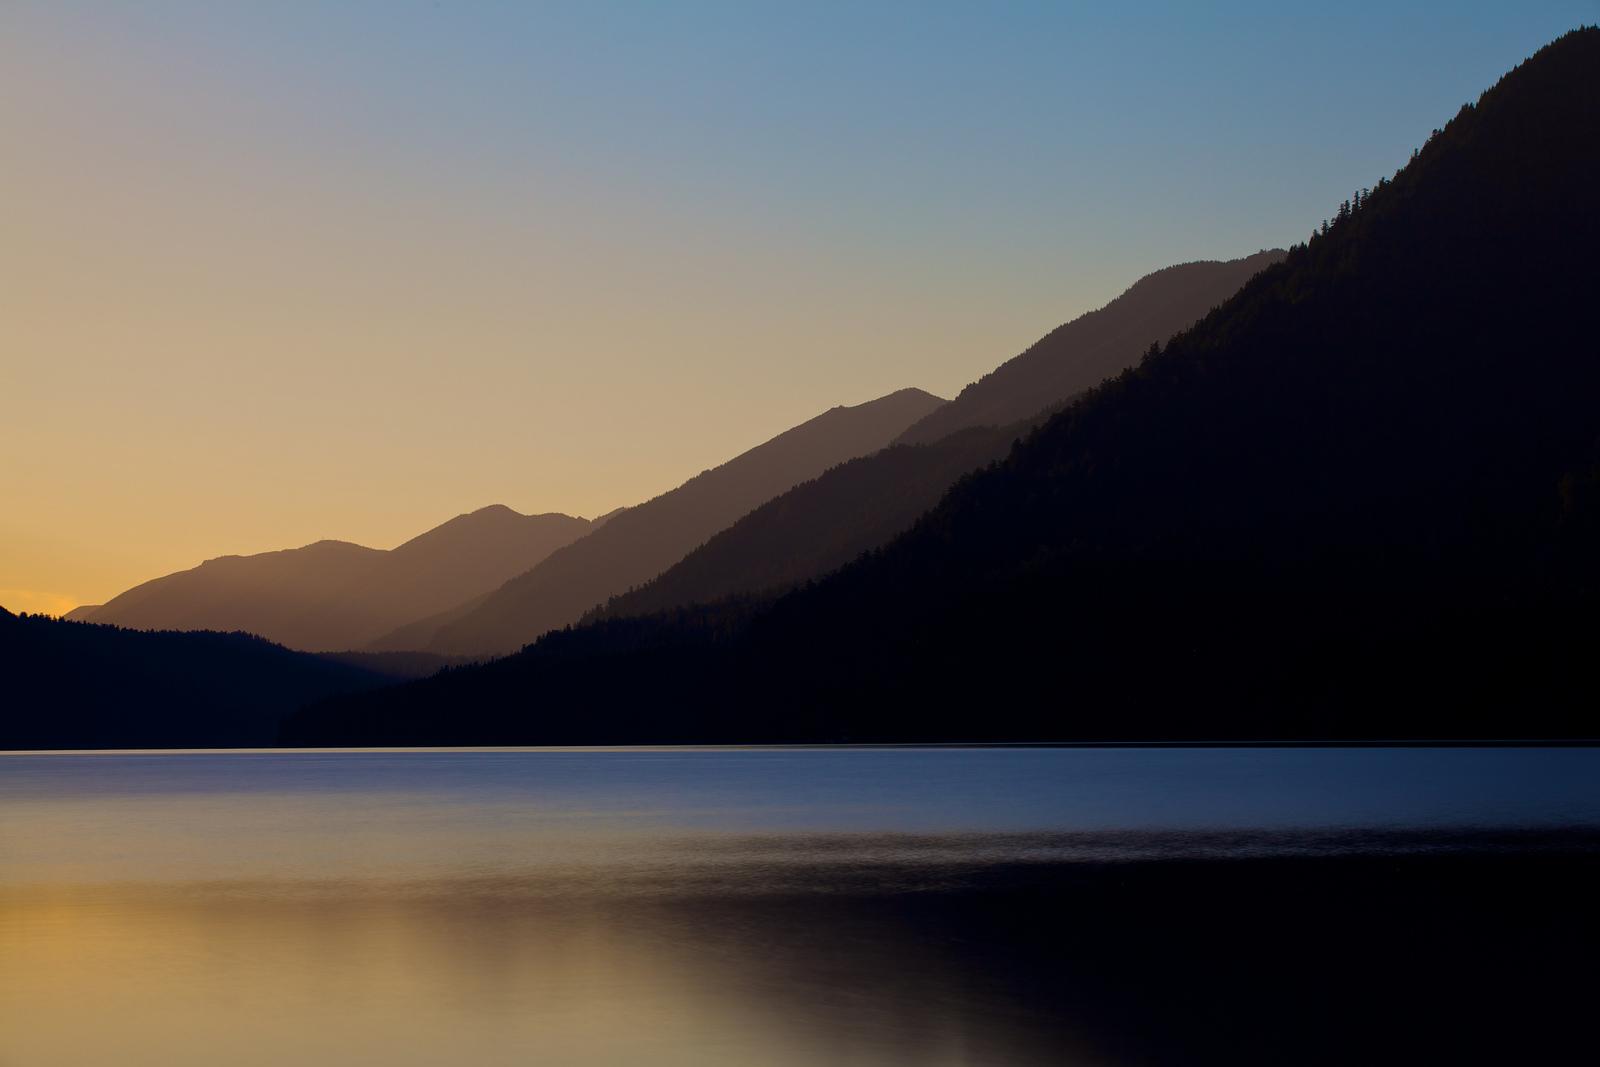 Lake Crescent Layers